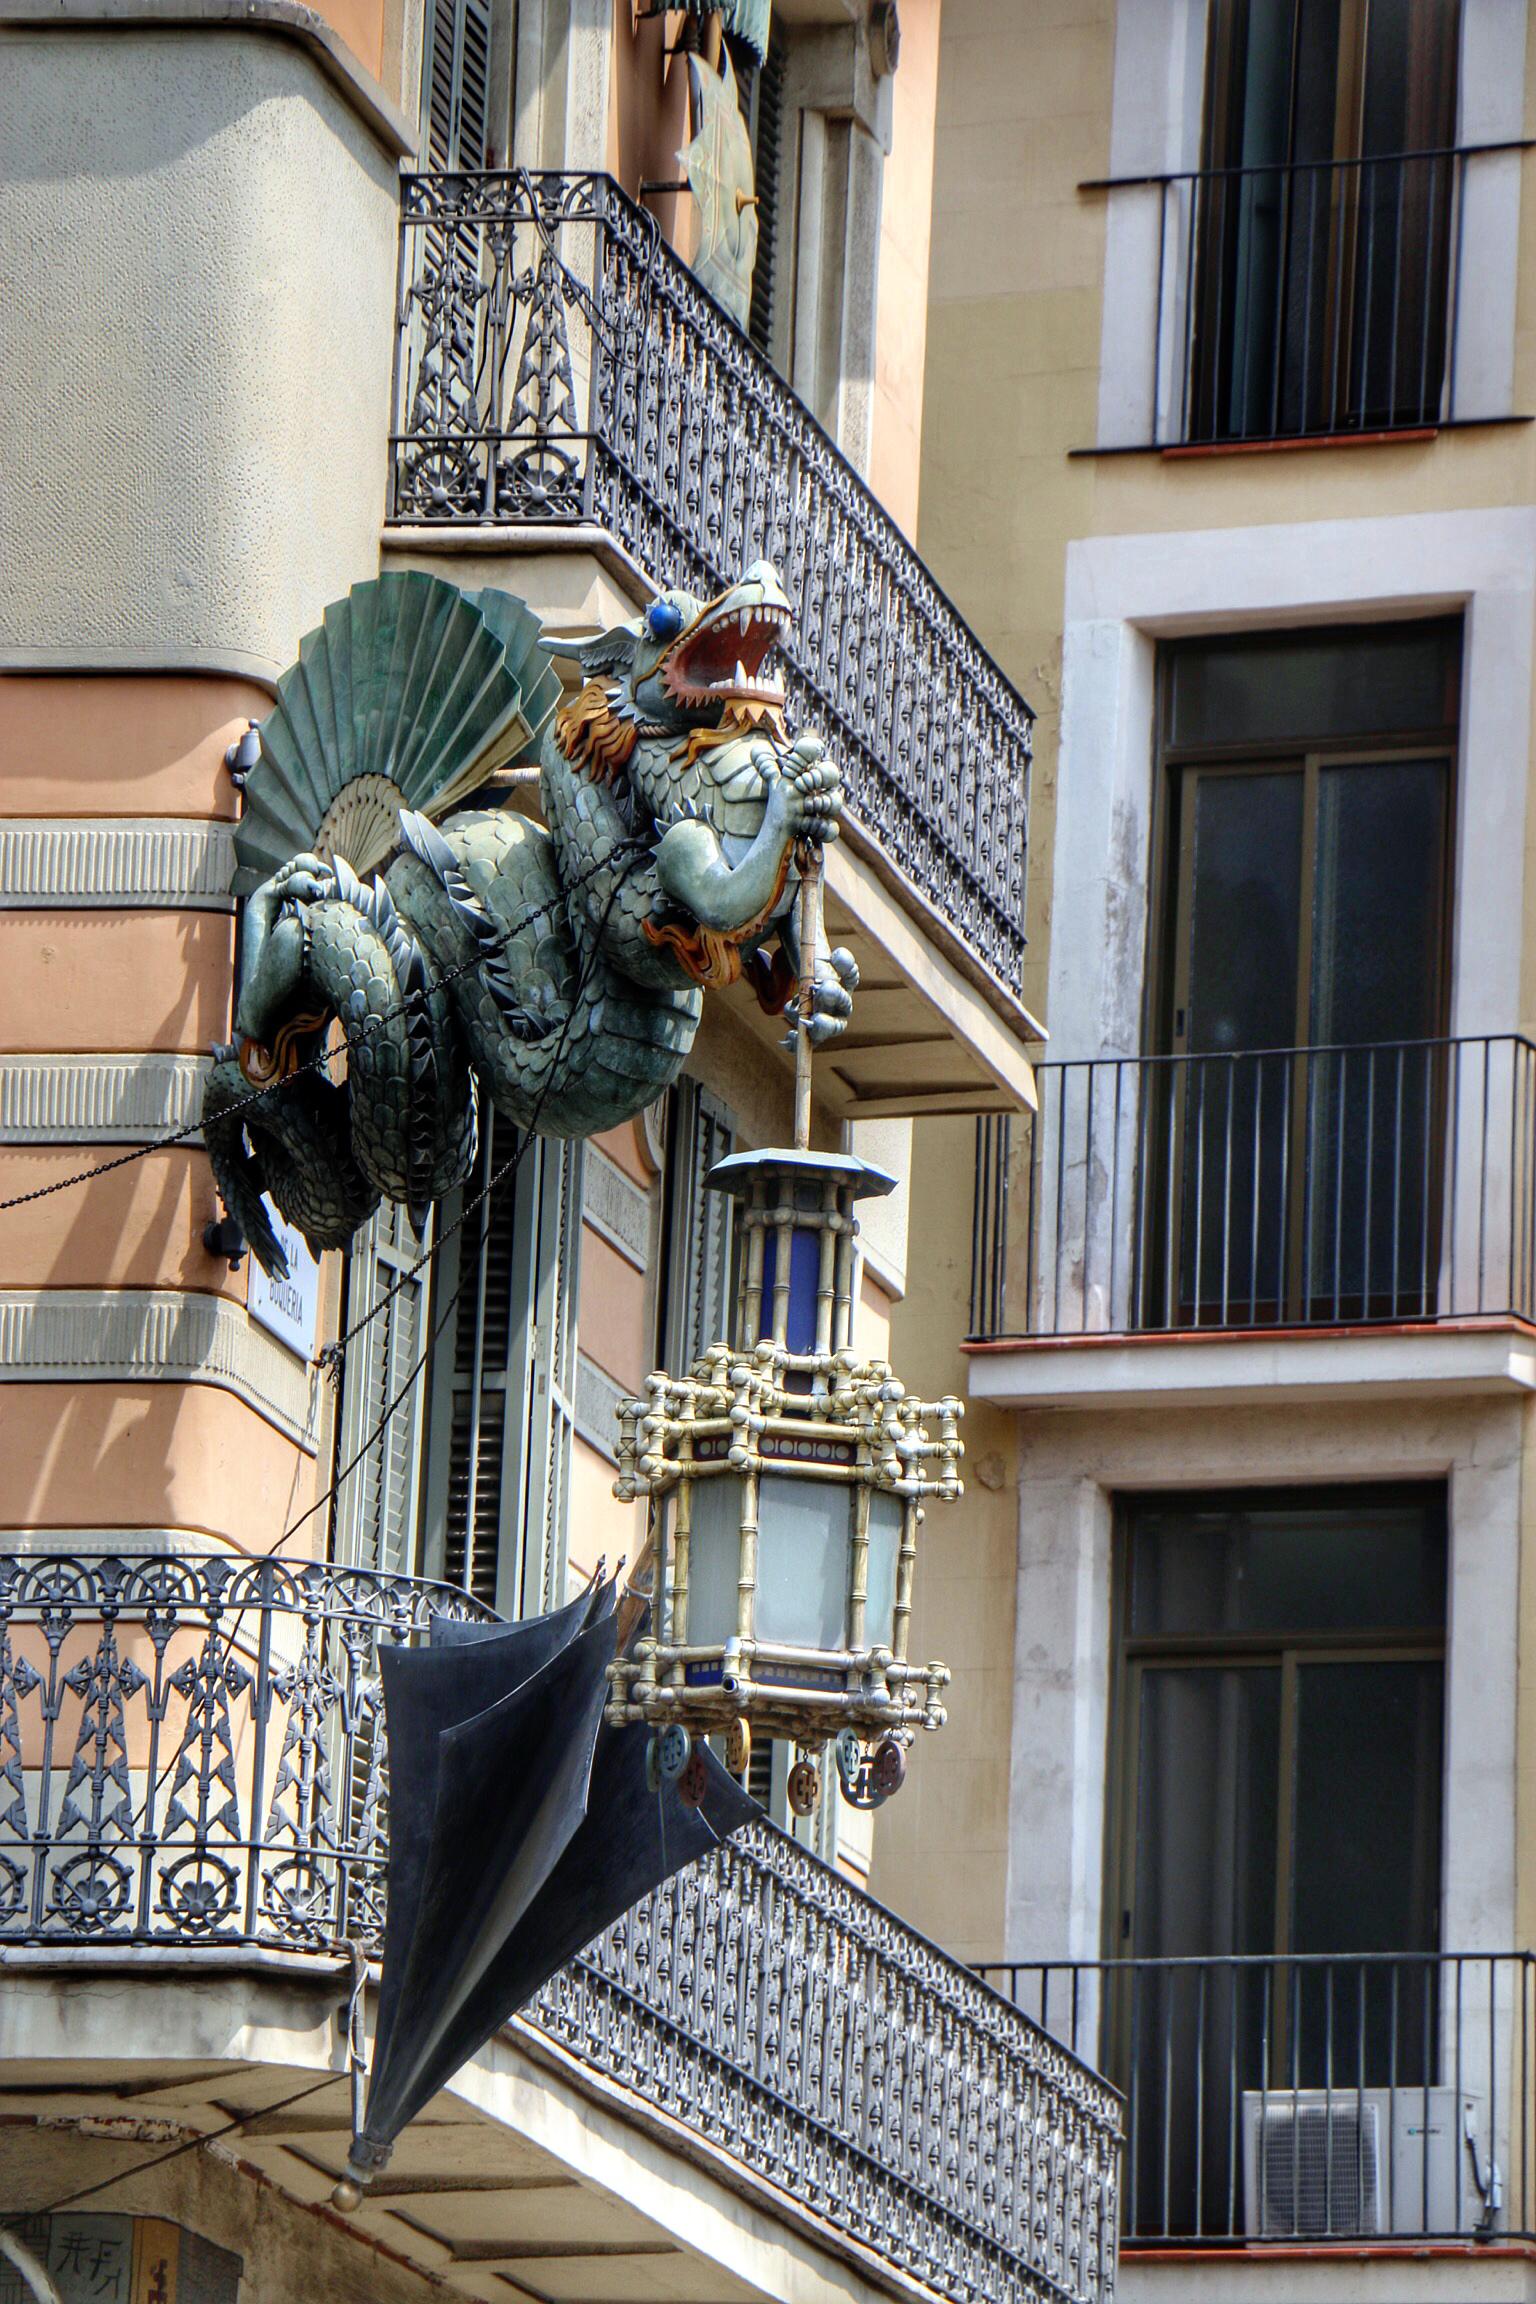 Barcelona - July 2014